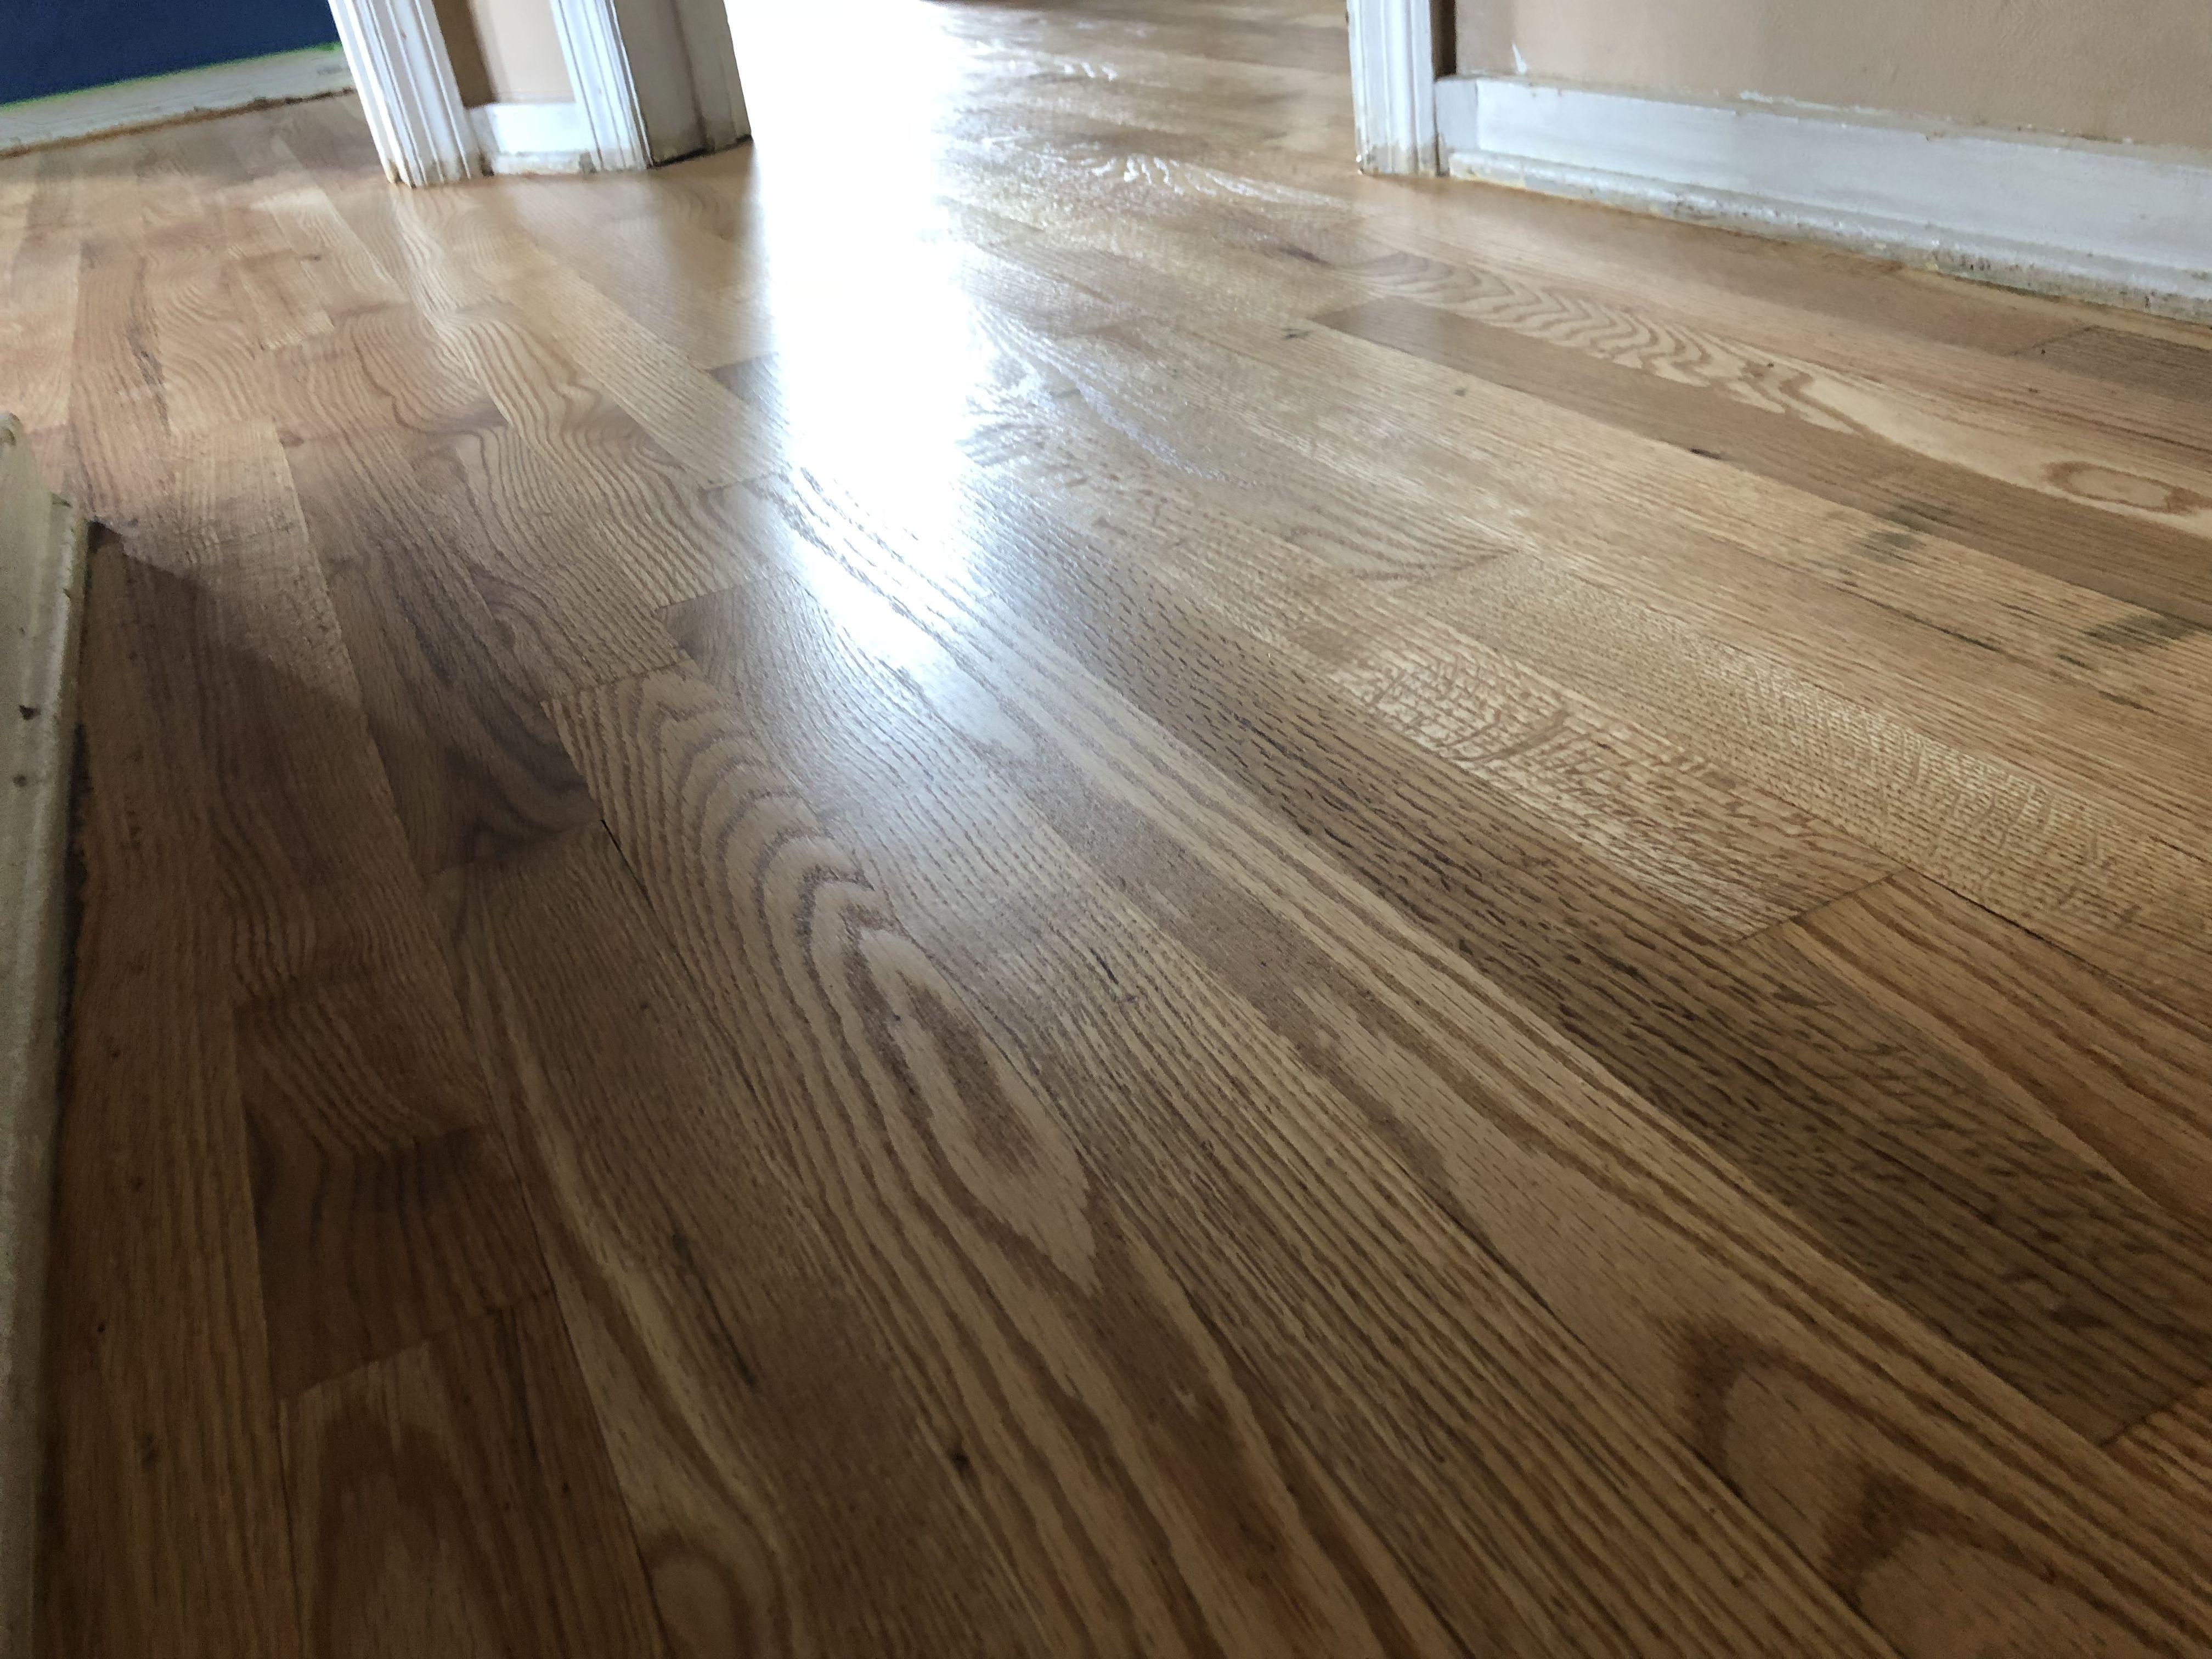 Semi gloss finish hardwood floor refinish in Grand Rapids